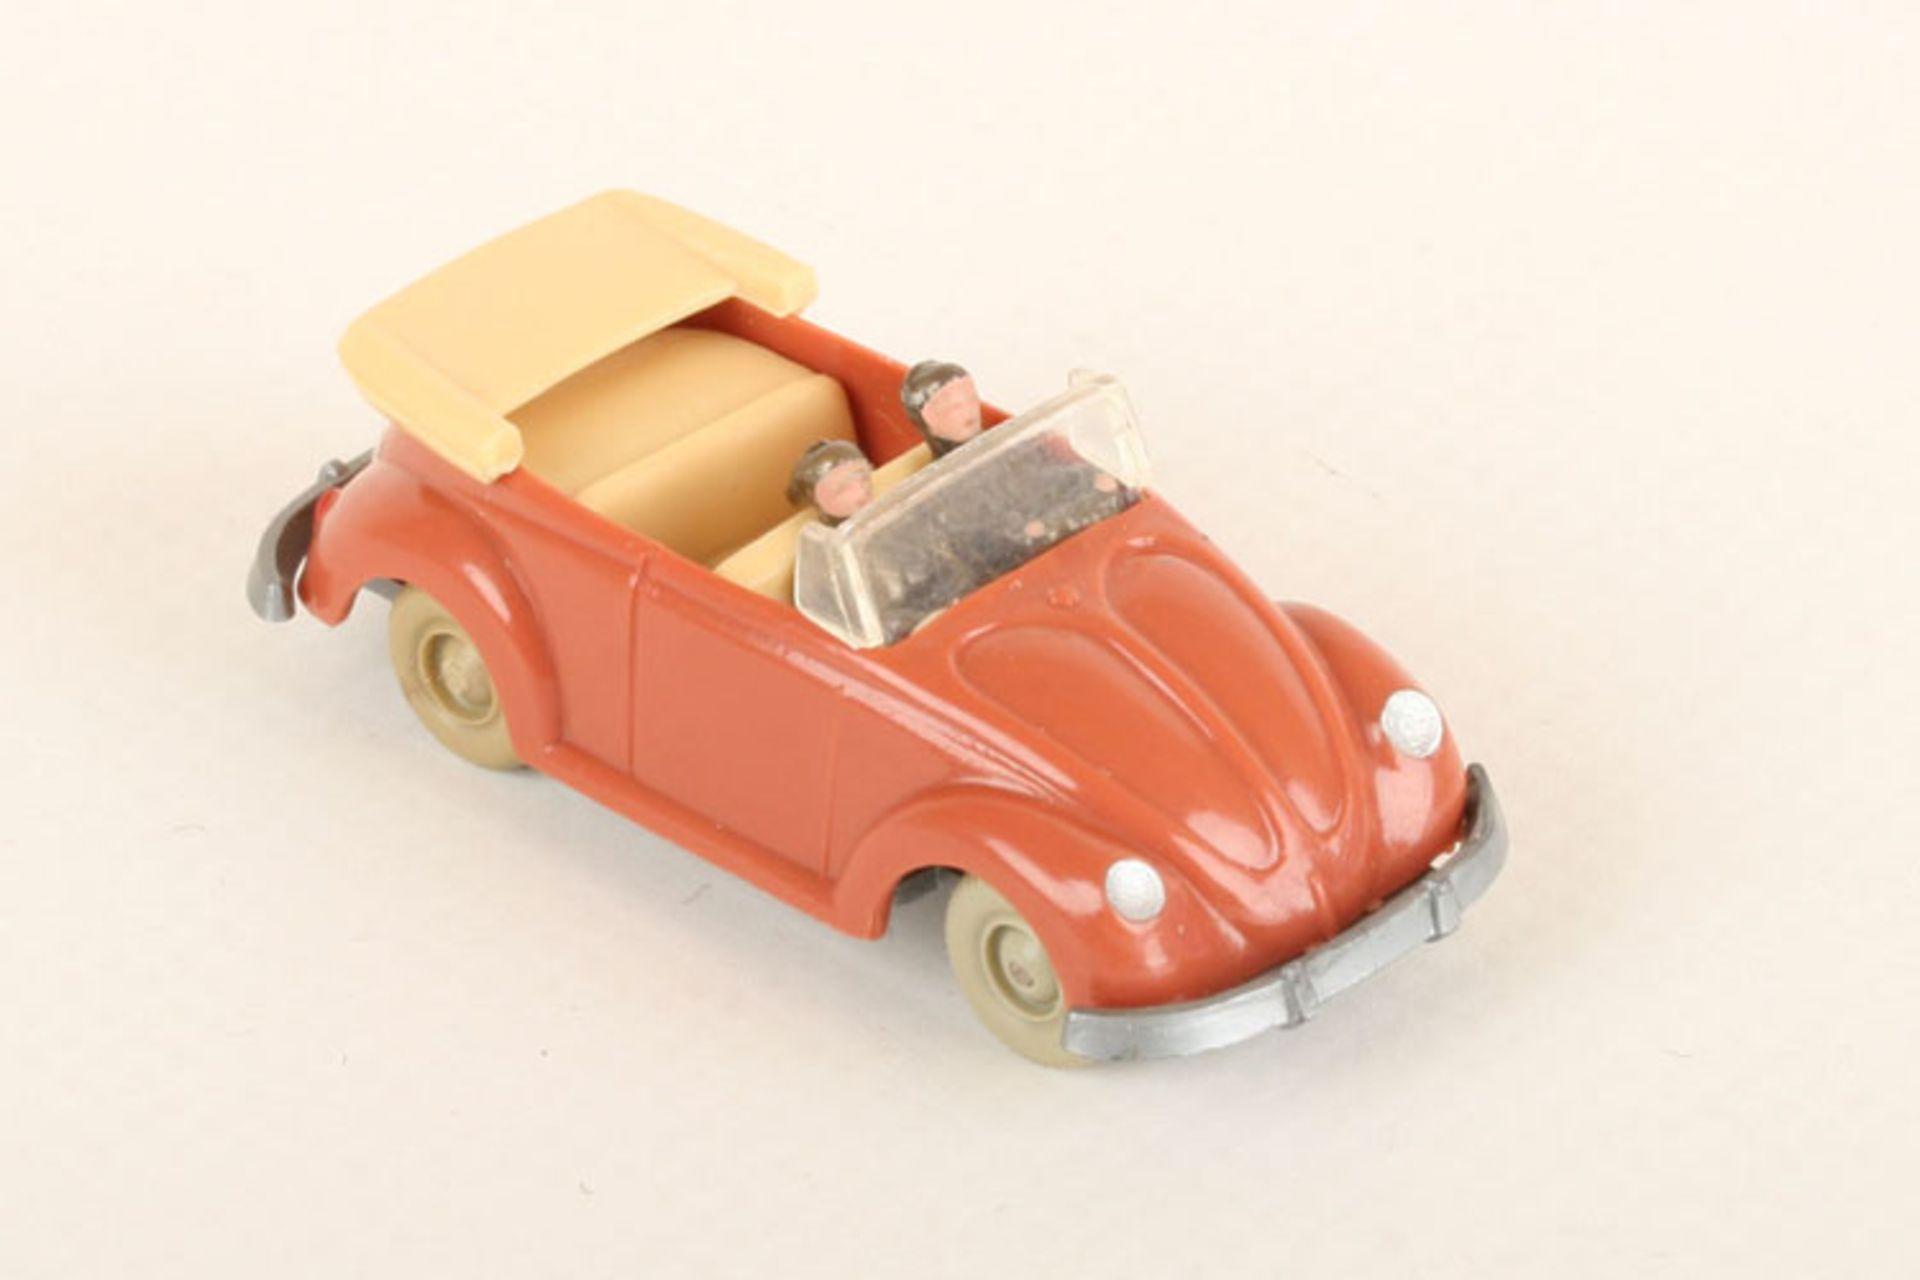 Los 1021 - Wiking VW Käfer Cabrio korallenrot 33/3h, neuwertig